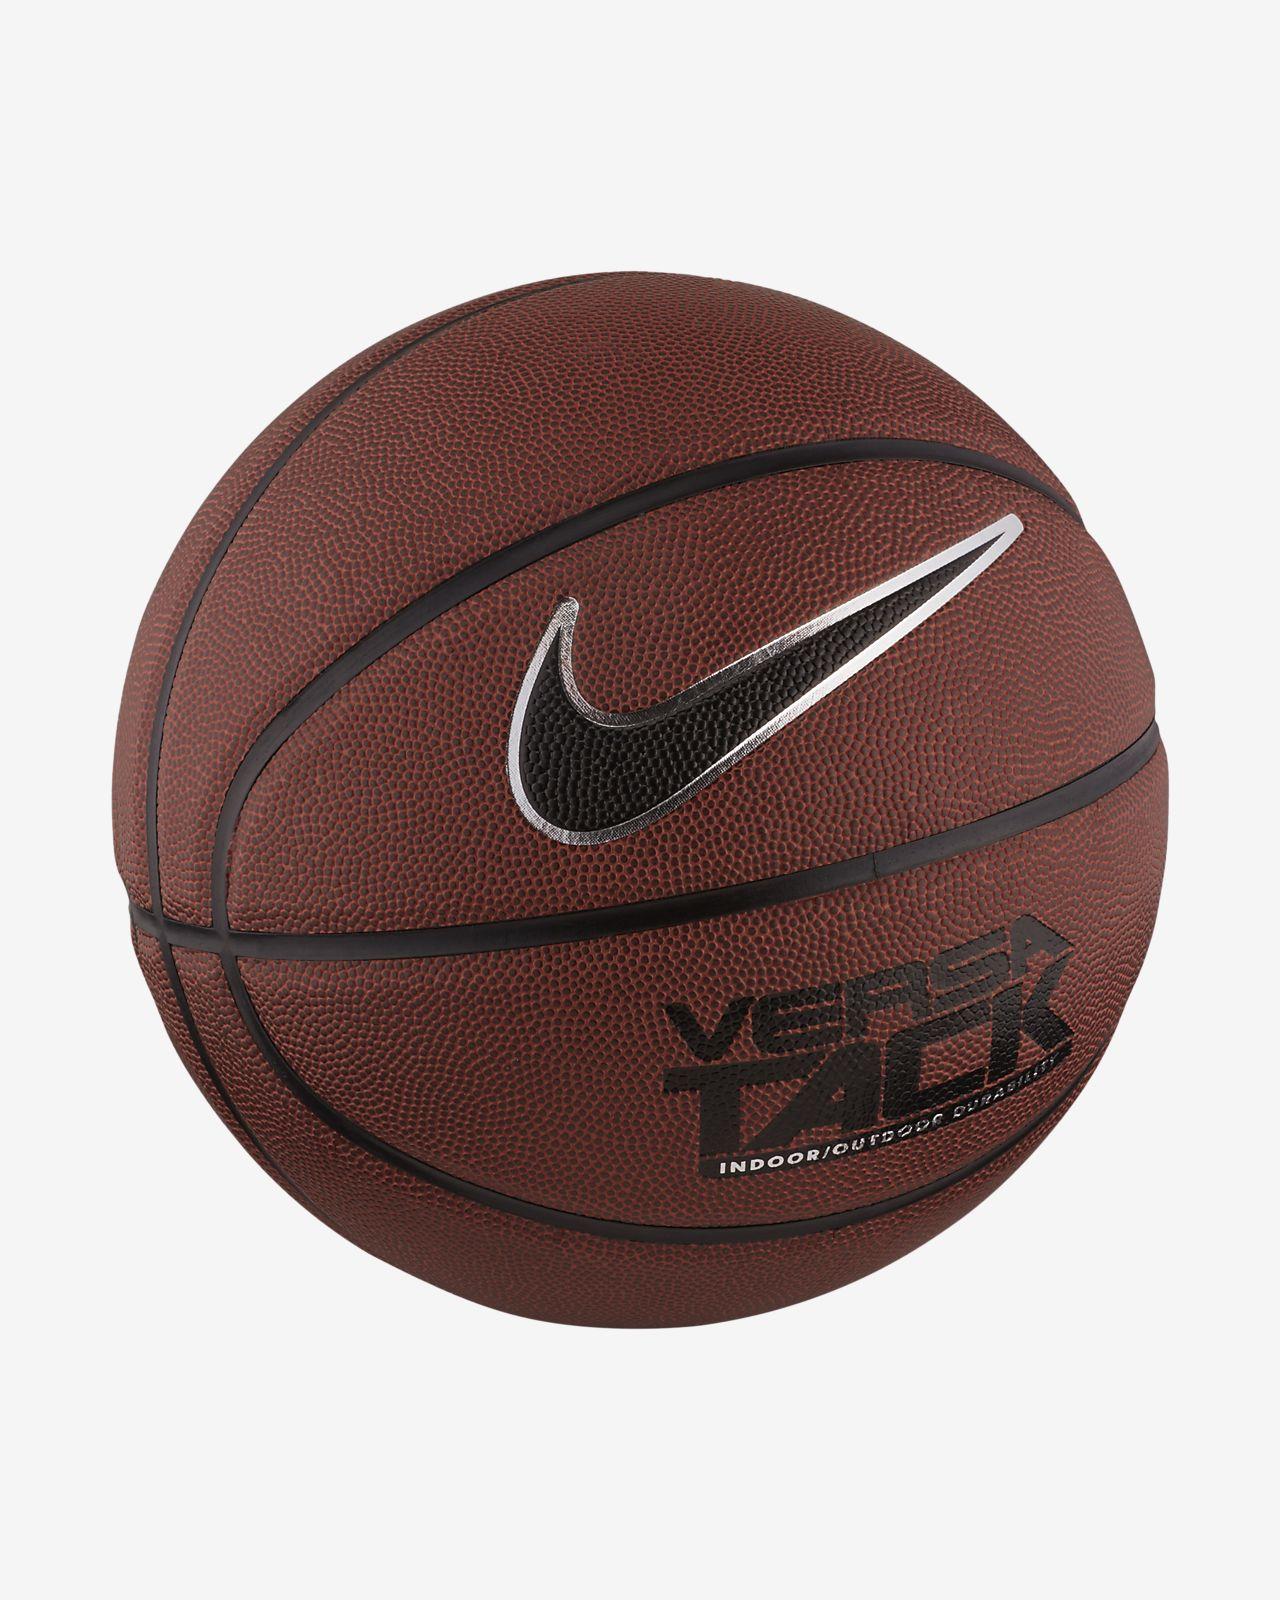 Nike Versa Tack 8P-basketball